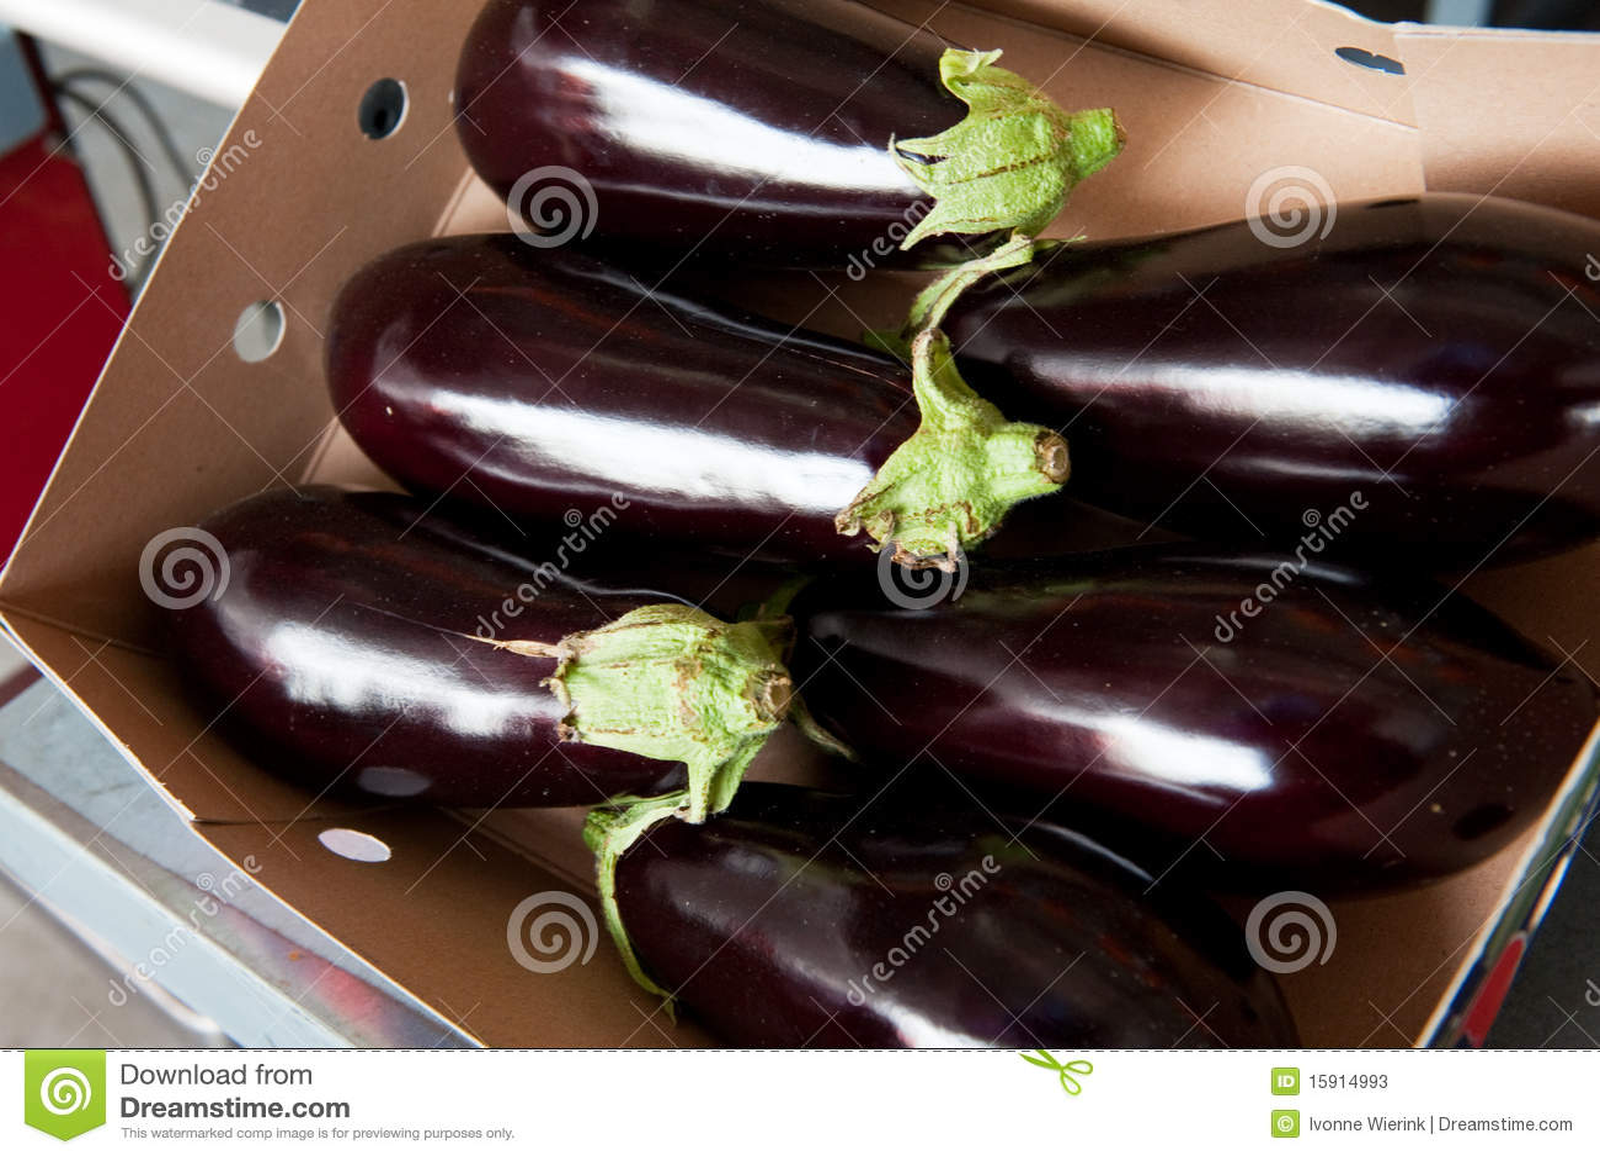 042bb439e9 Box fresh aubergines stock image. Image of whole, retail - 15914993